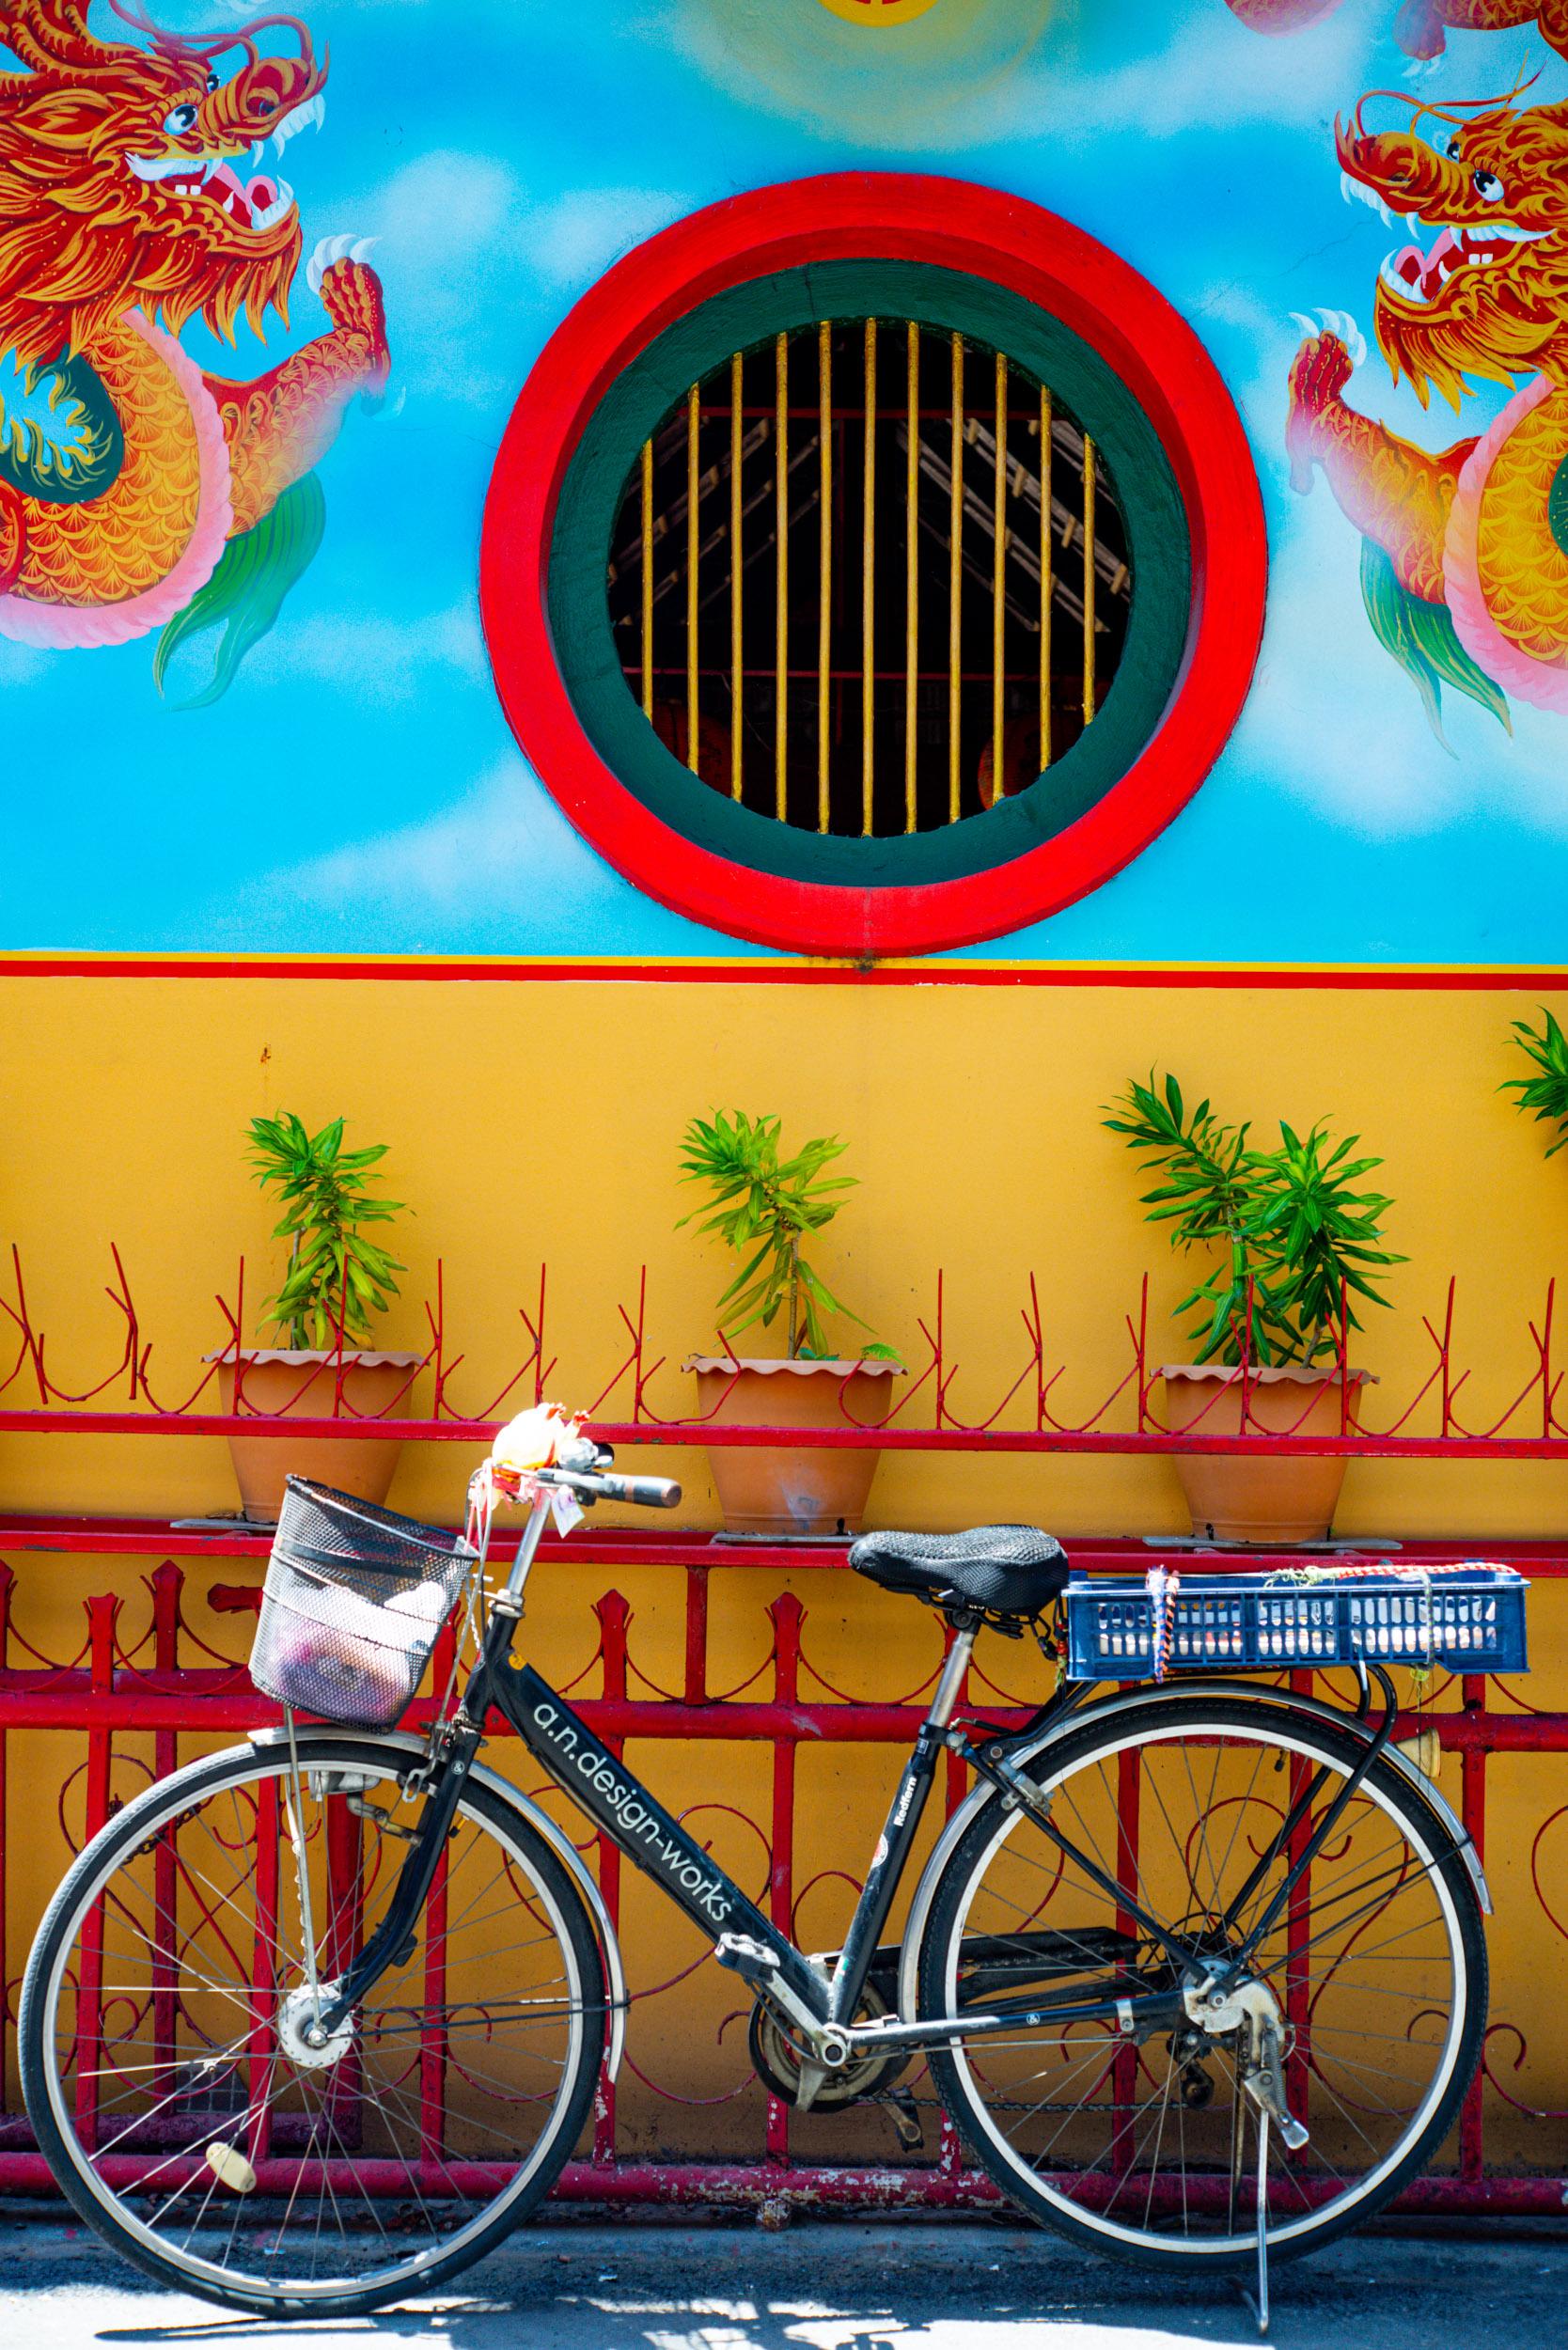 © Kevin Landwer-Johan Street Photography Ideas - Bicicletas